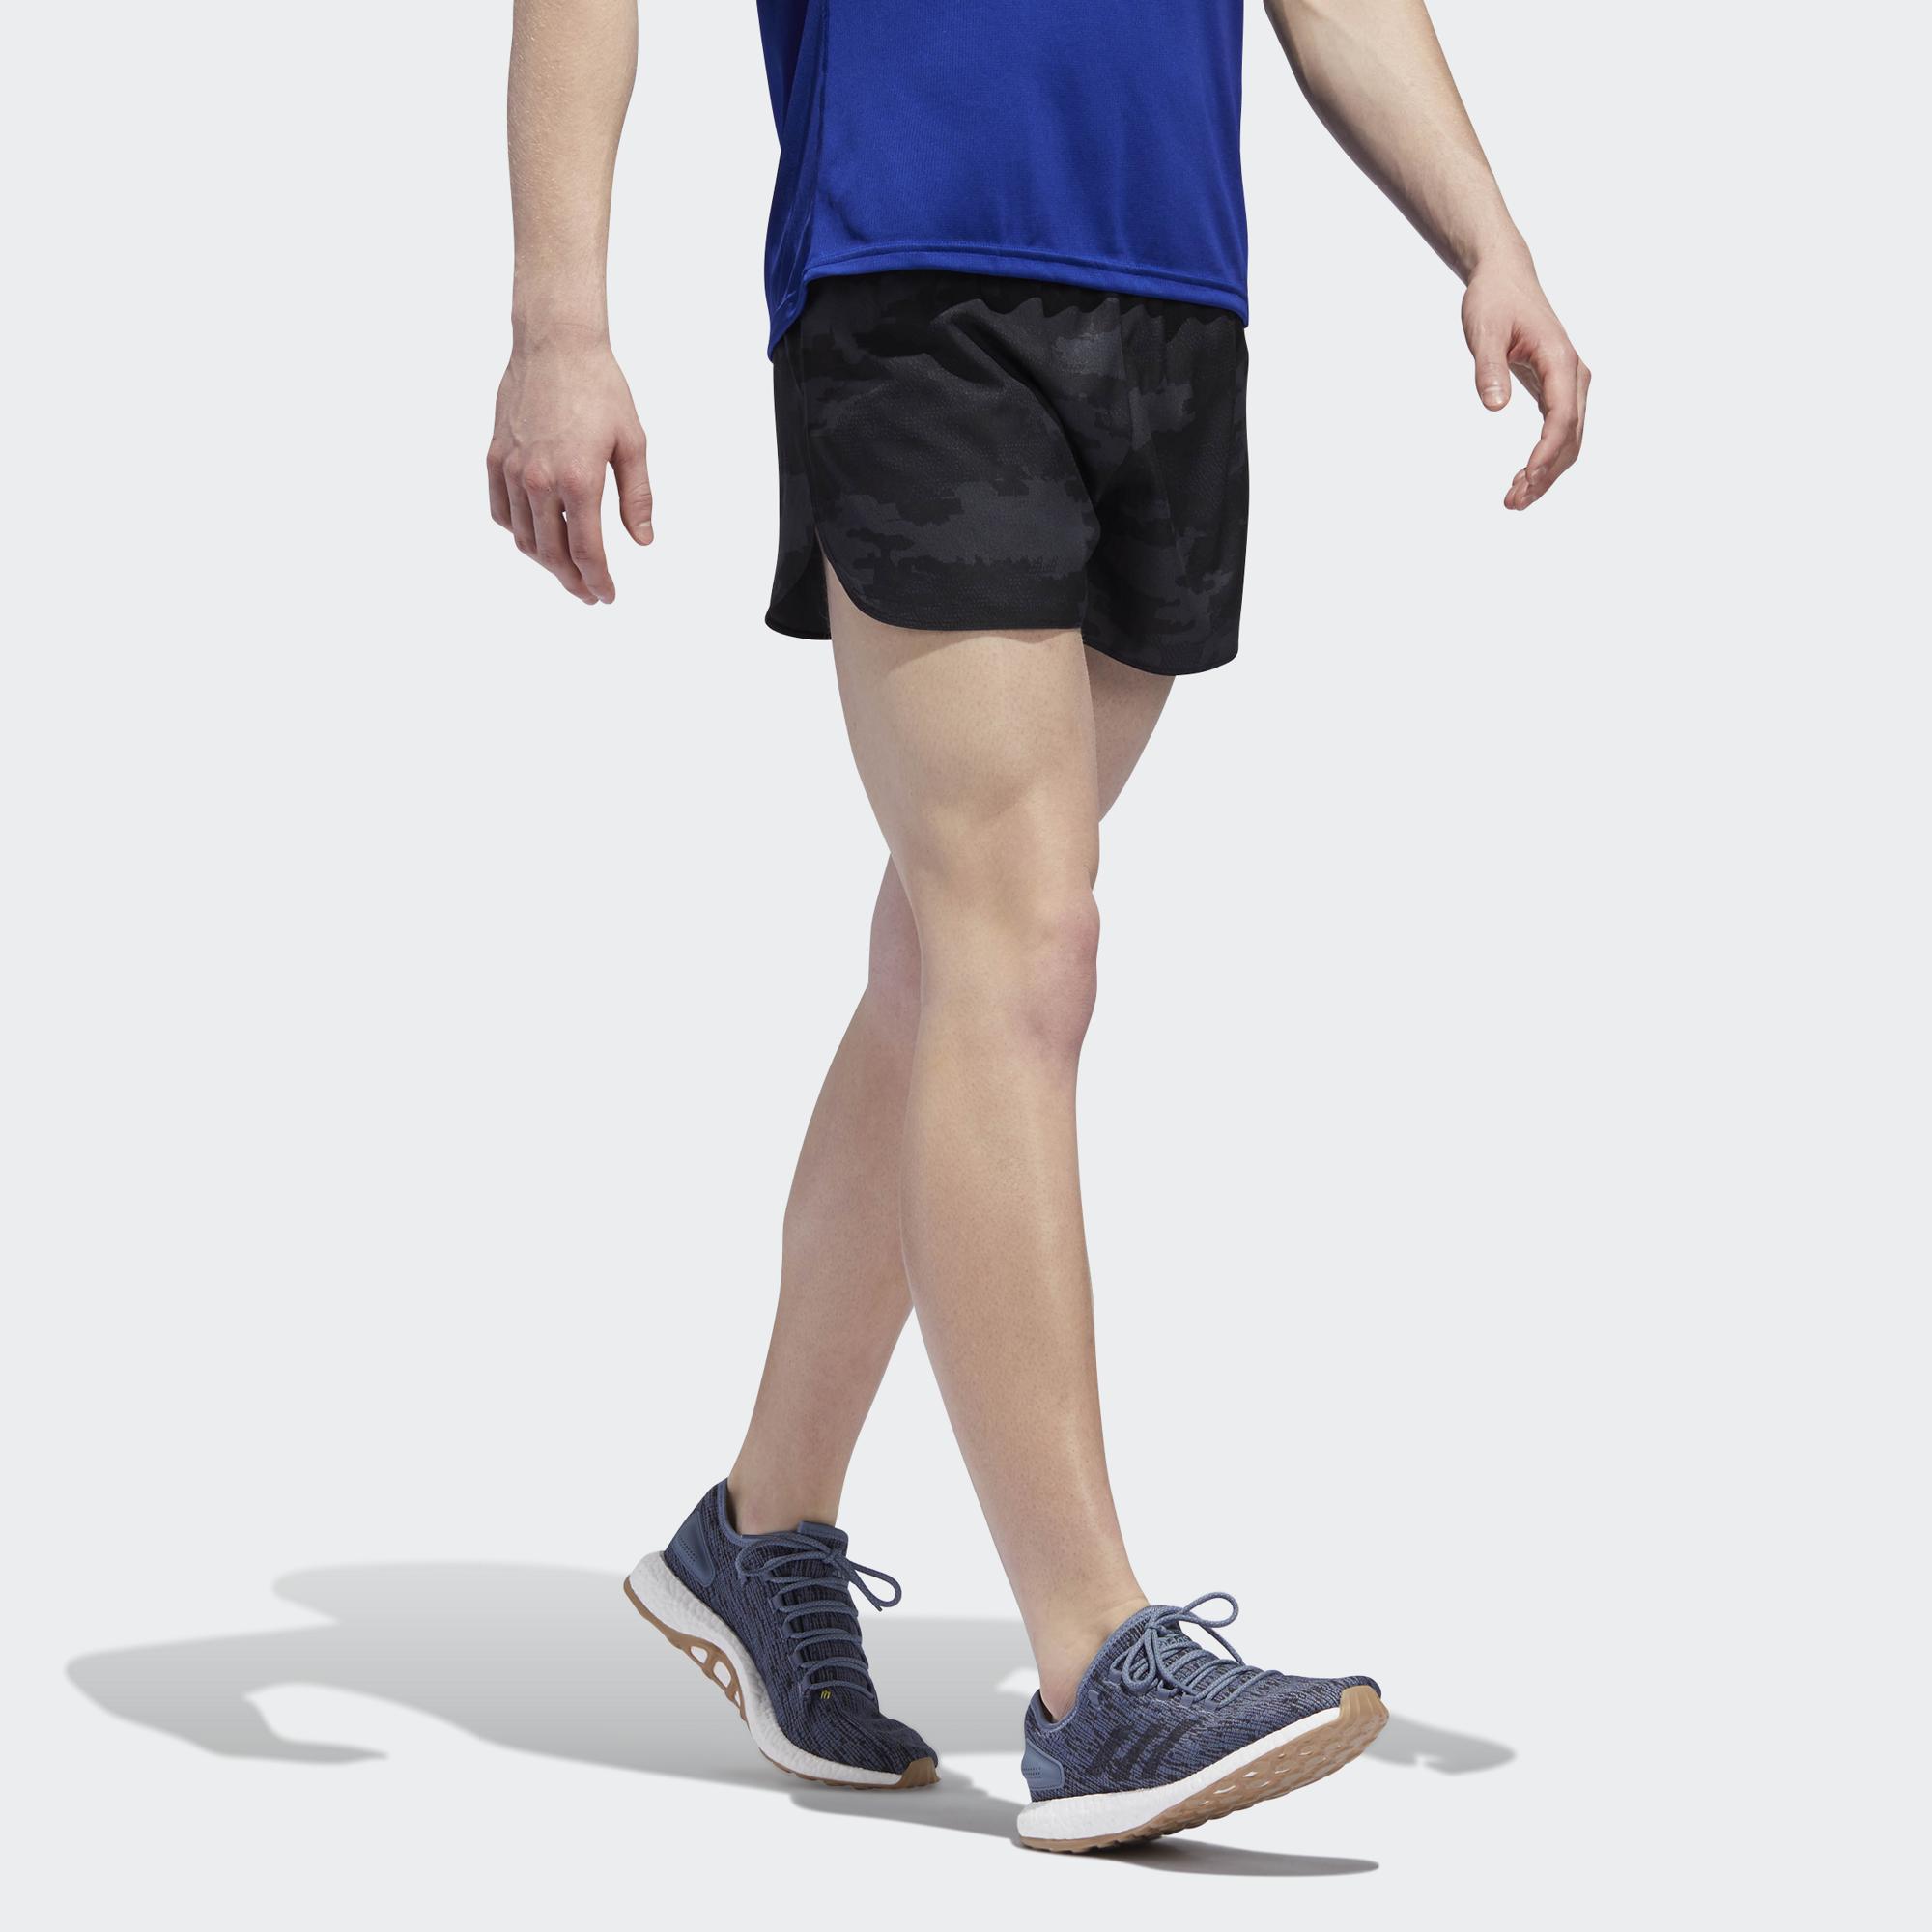 ADIDAS Response Pantaloncini da Uomo Corsa SPLIT Grigio